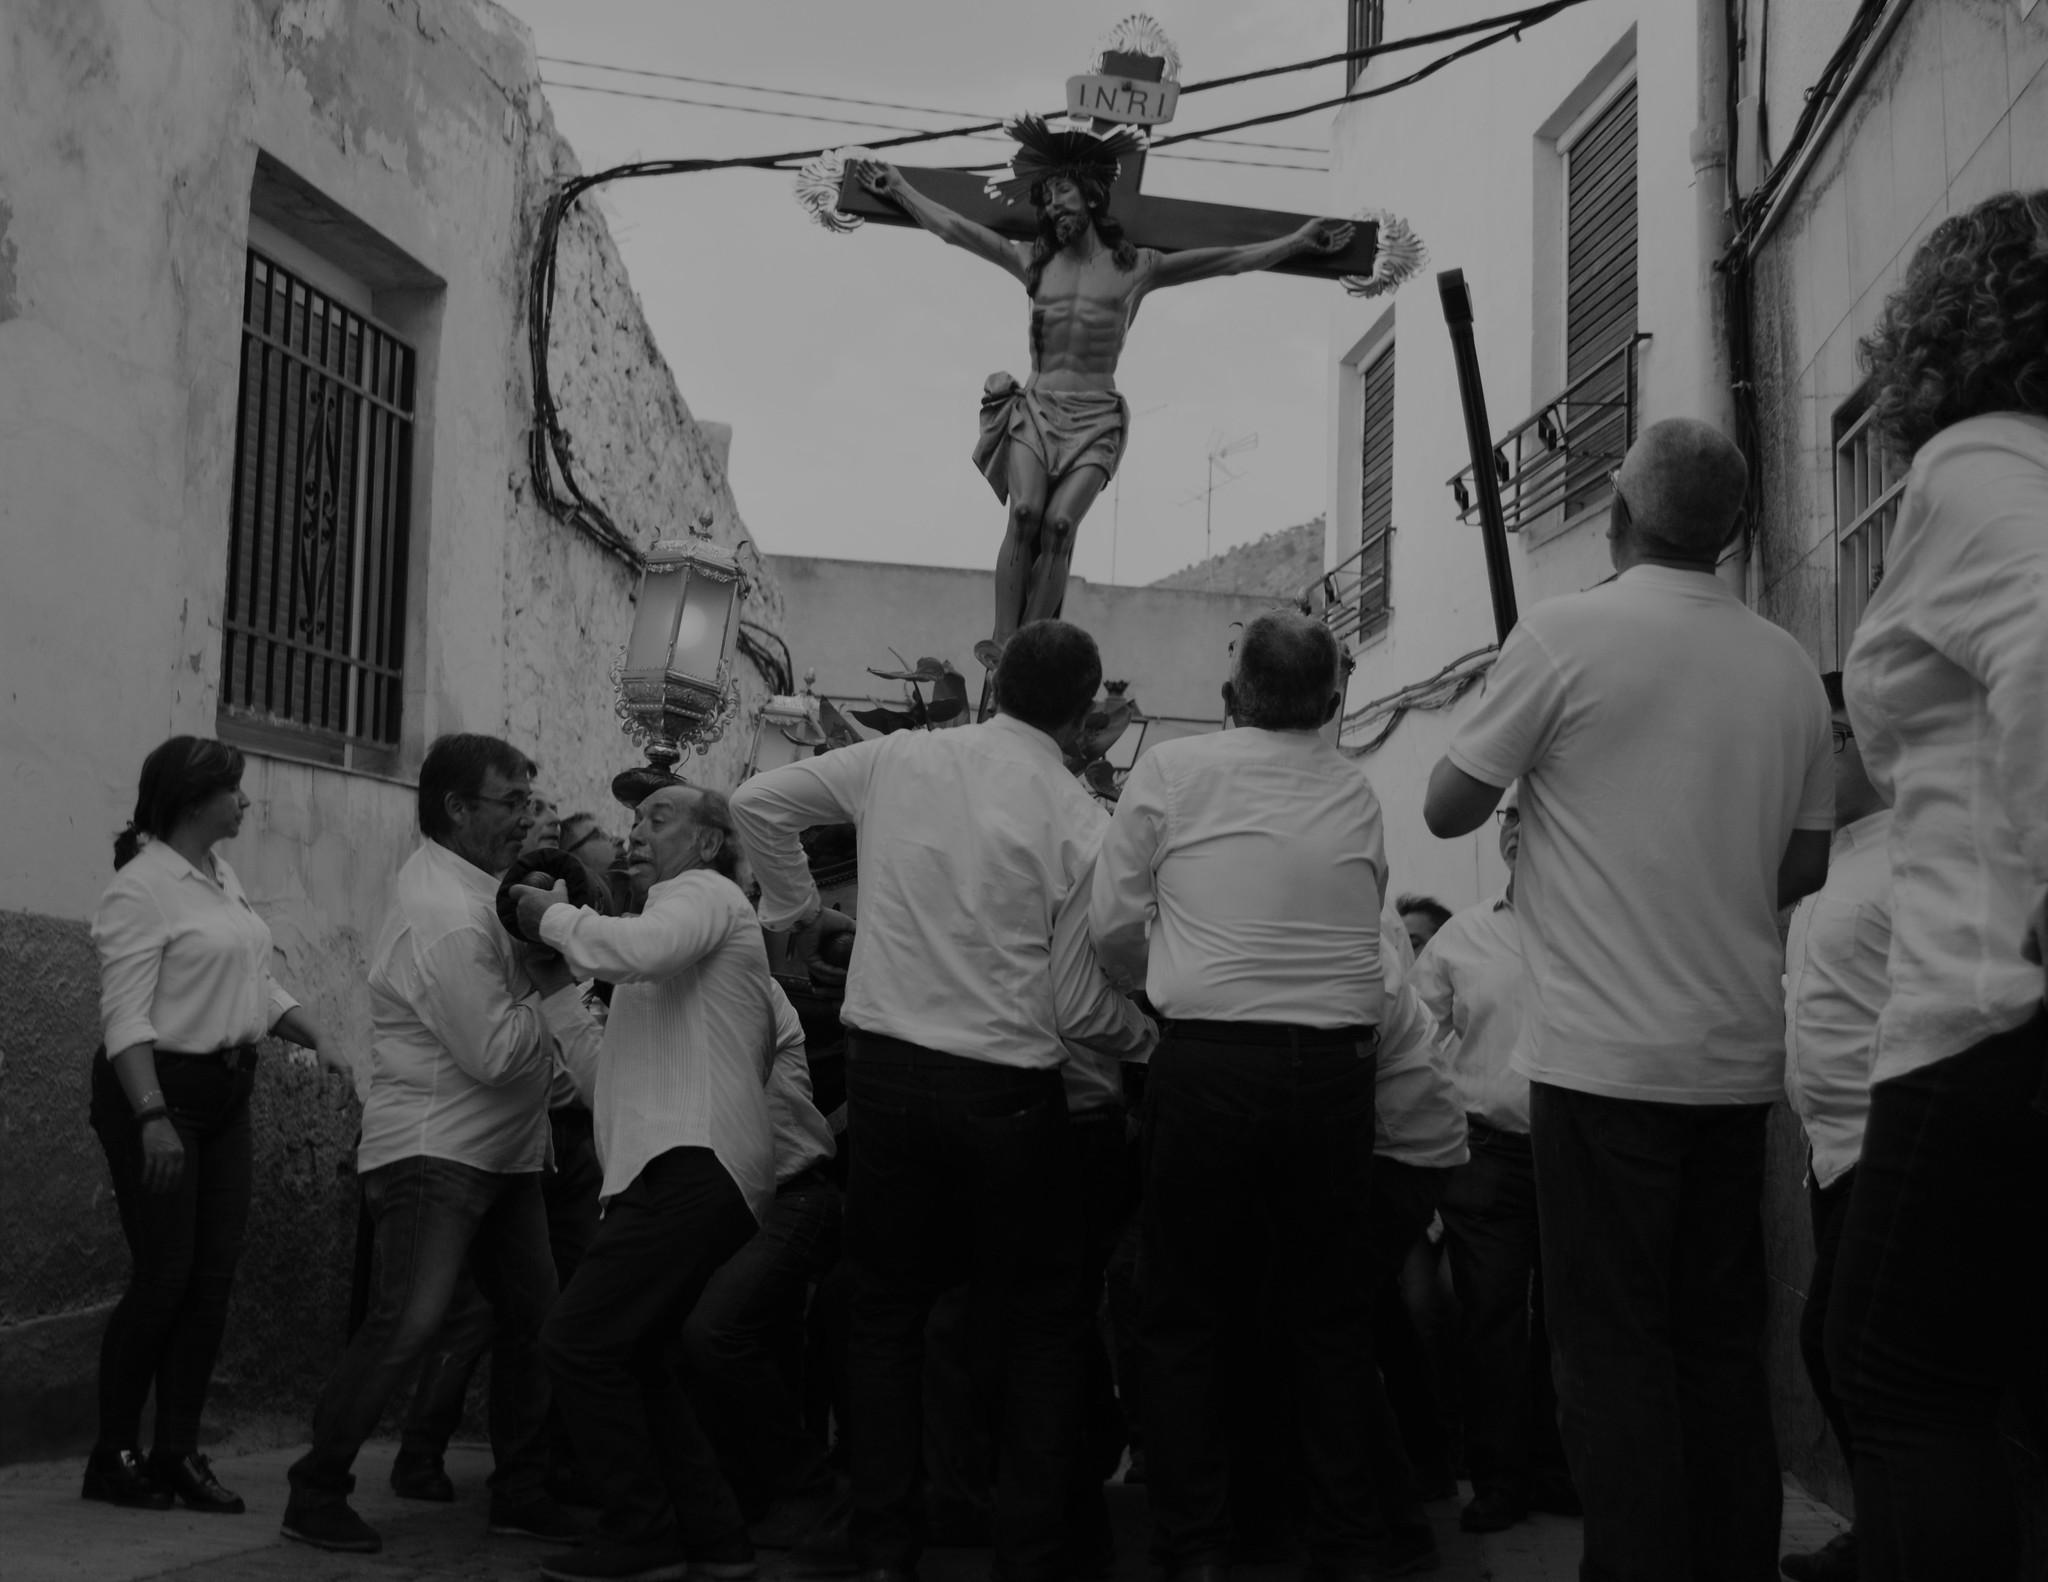 (2019-07-07) Procesión de subida - Adrián Romero Montesinos (16)